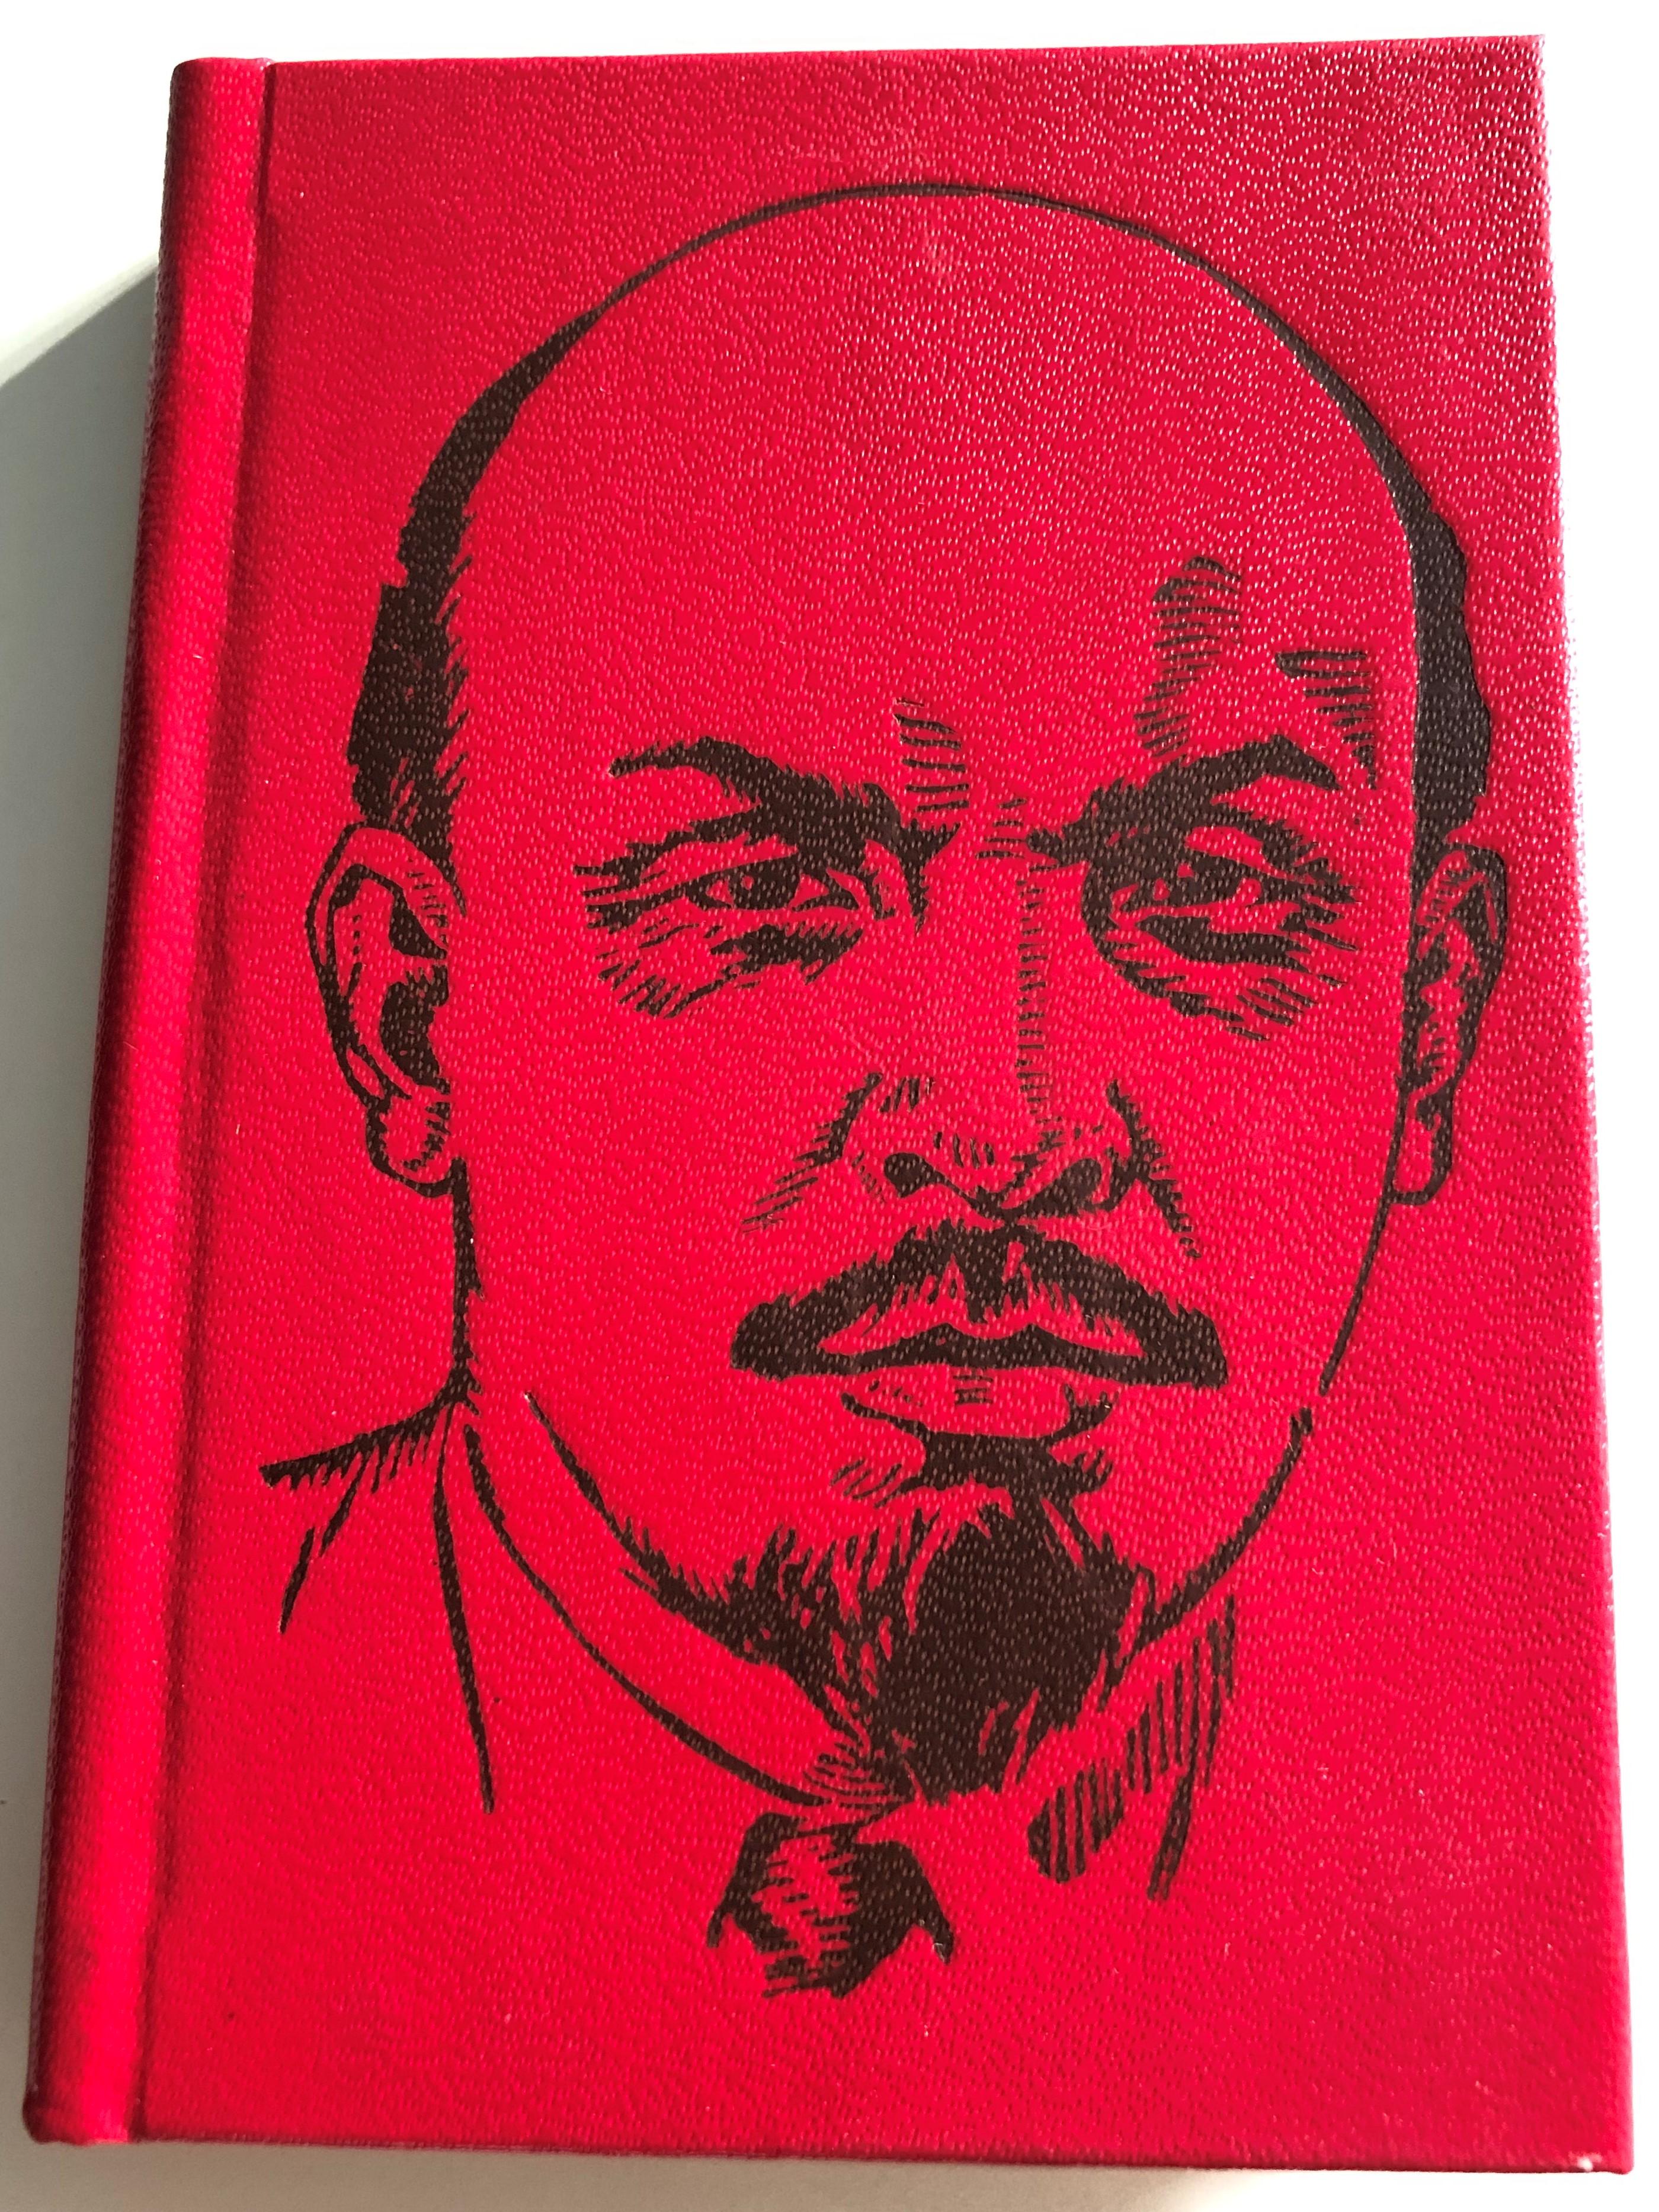 -ukrainian-language-poetry-by-soviet-authors-dedicated-to-lenin-hardcover-golden-edges-pocket-size-i-1975-1-.jpg